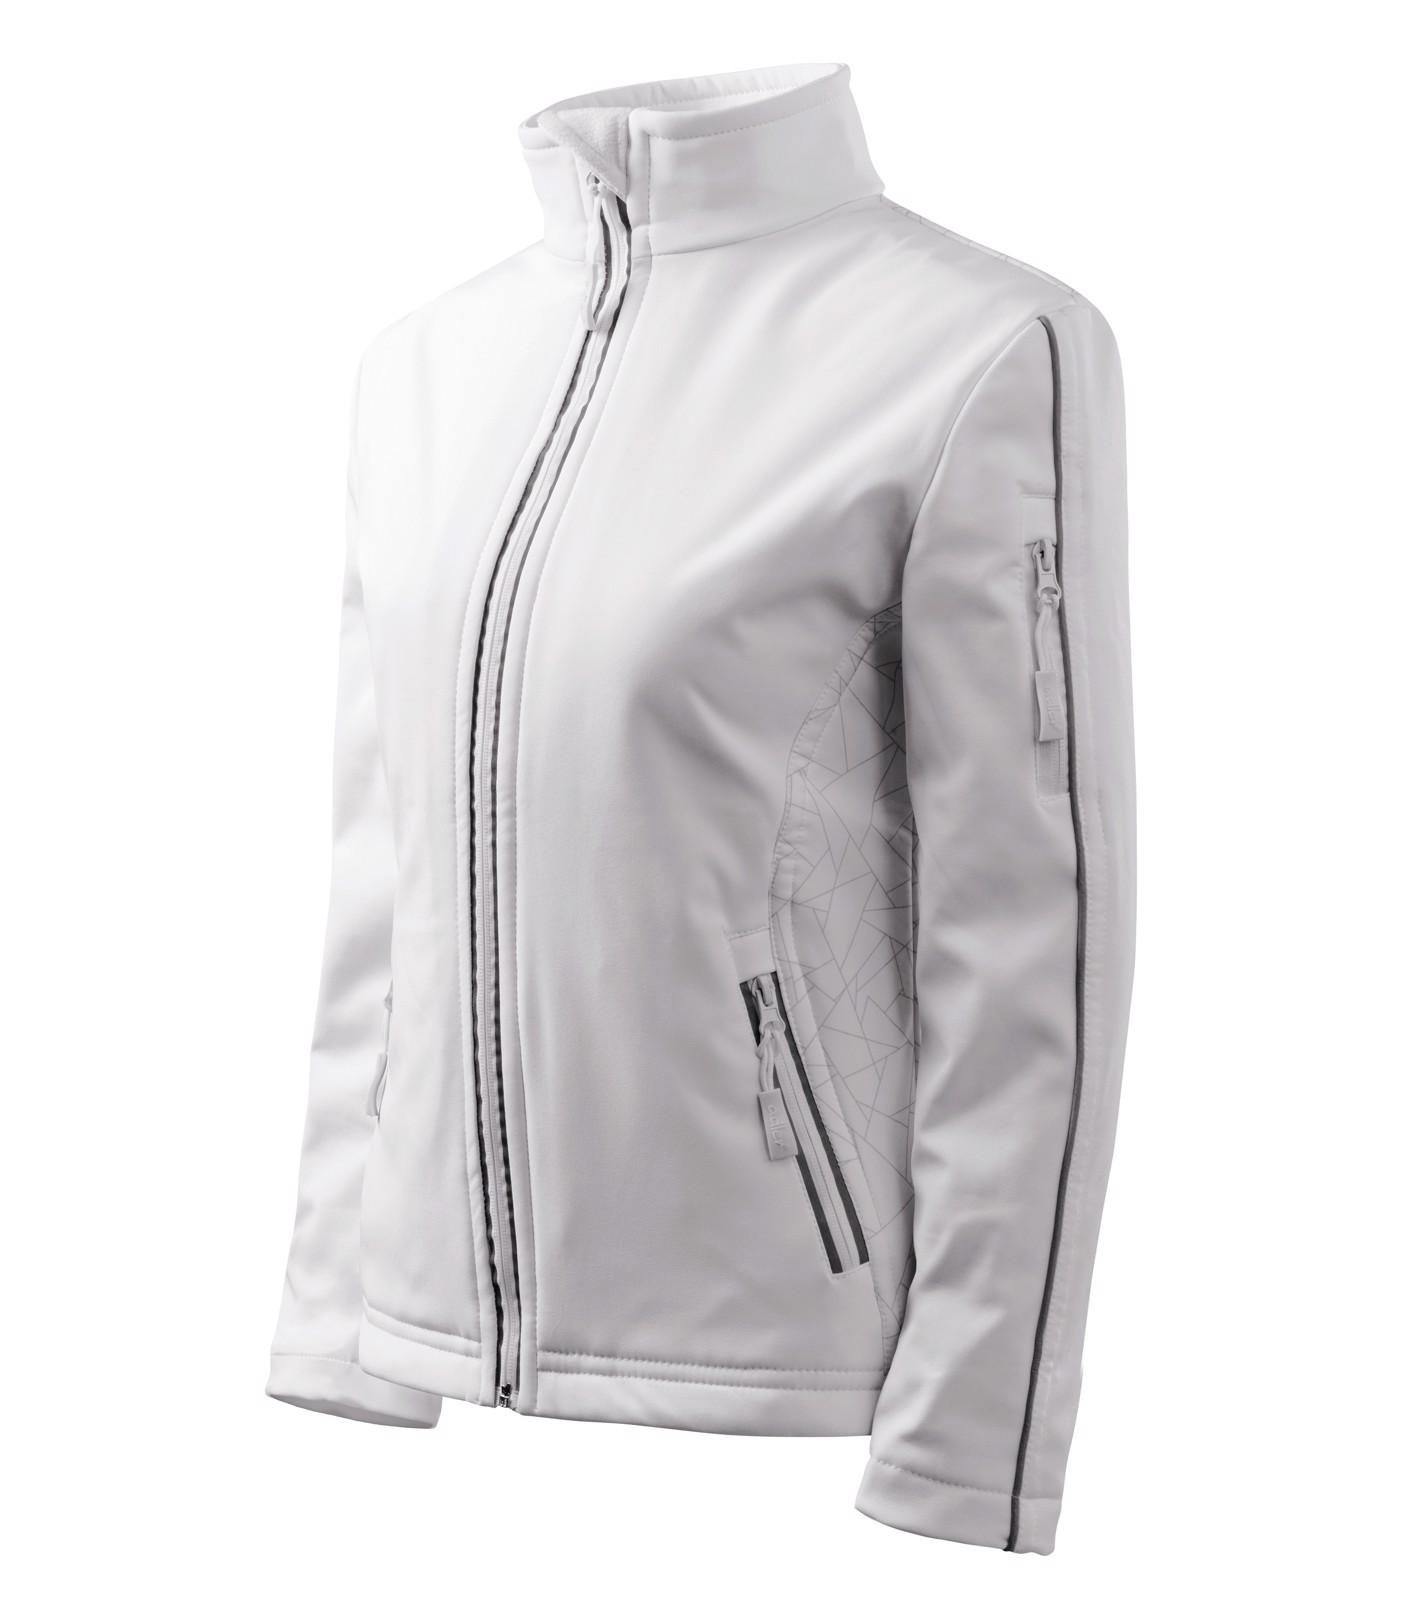 Bunda dámská Malfini Softshell Jacket - Bílá / S